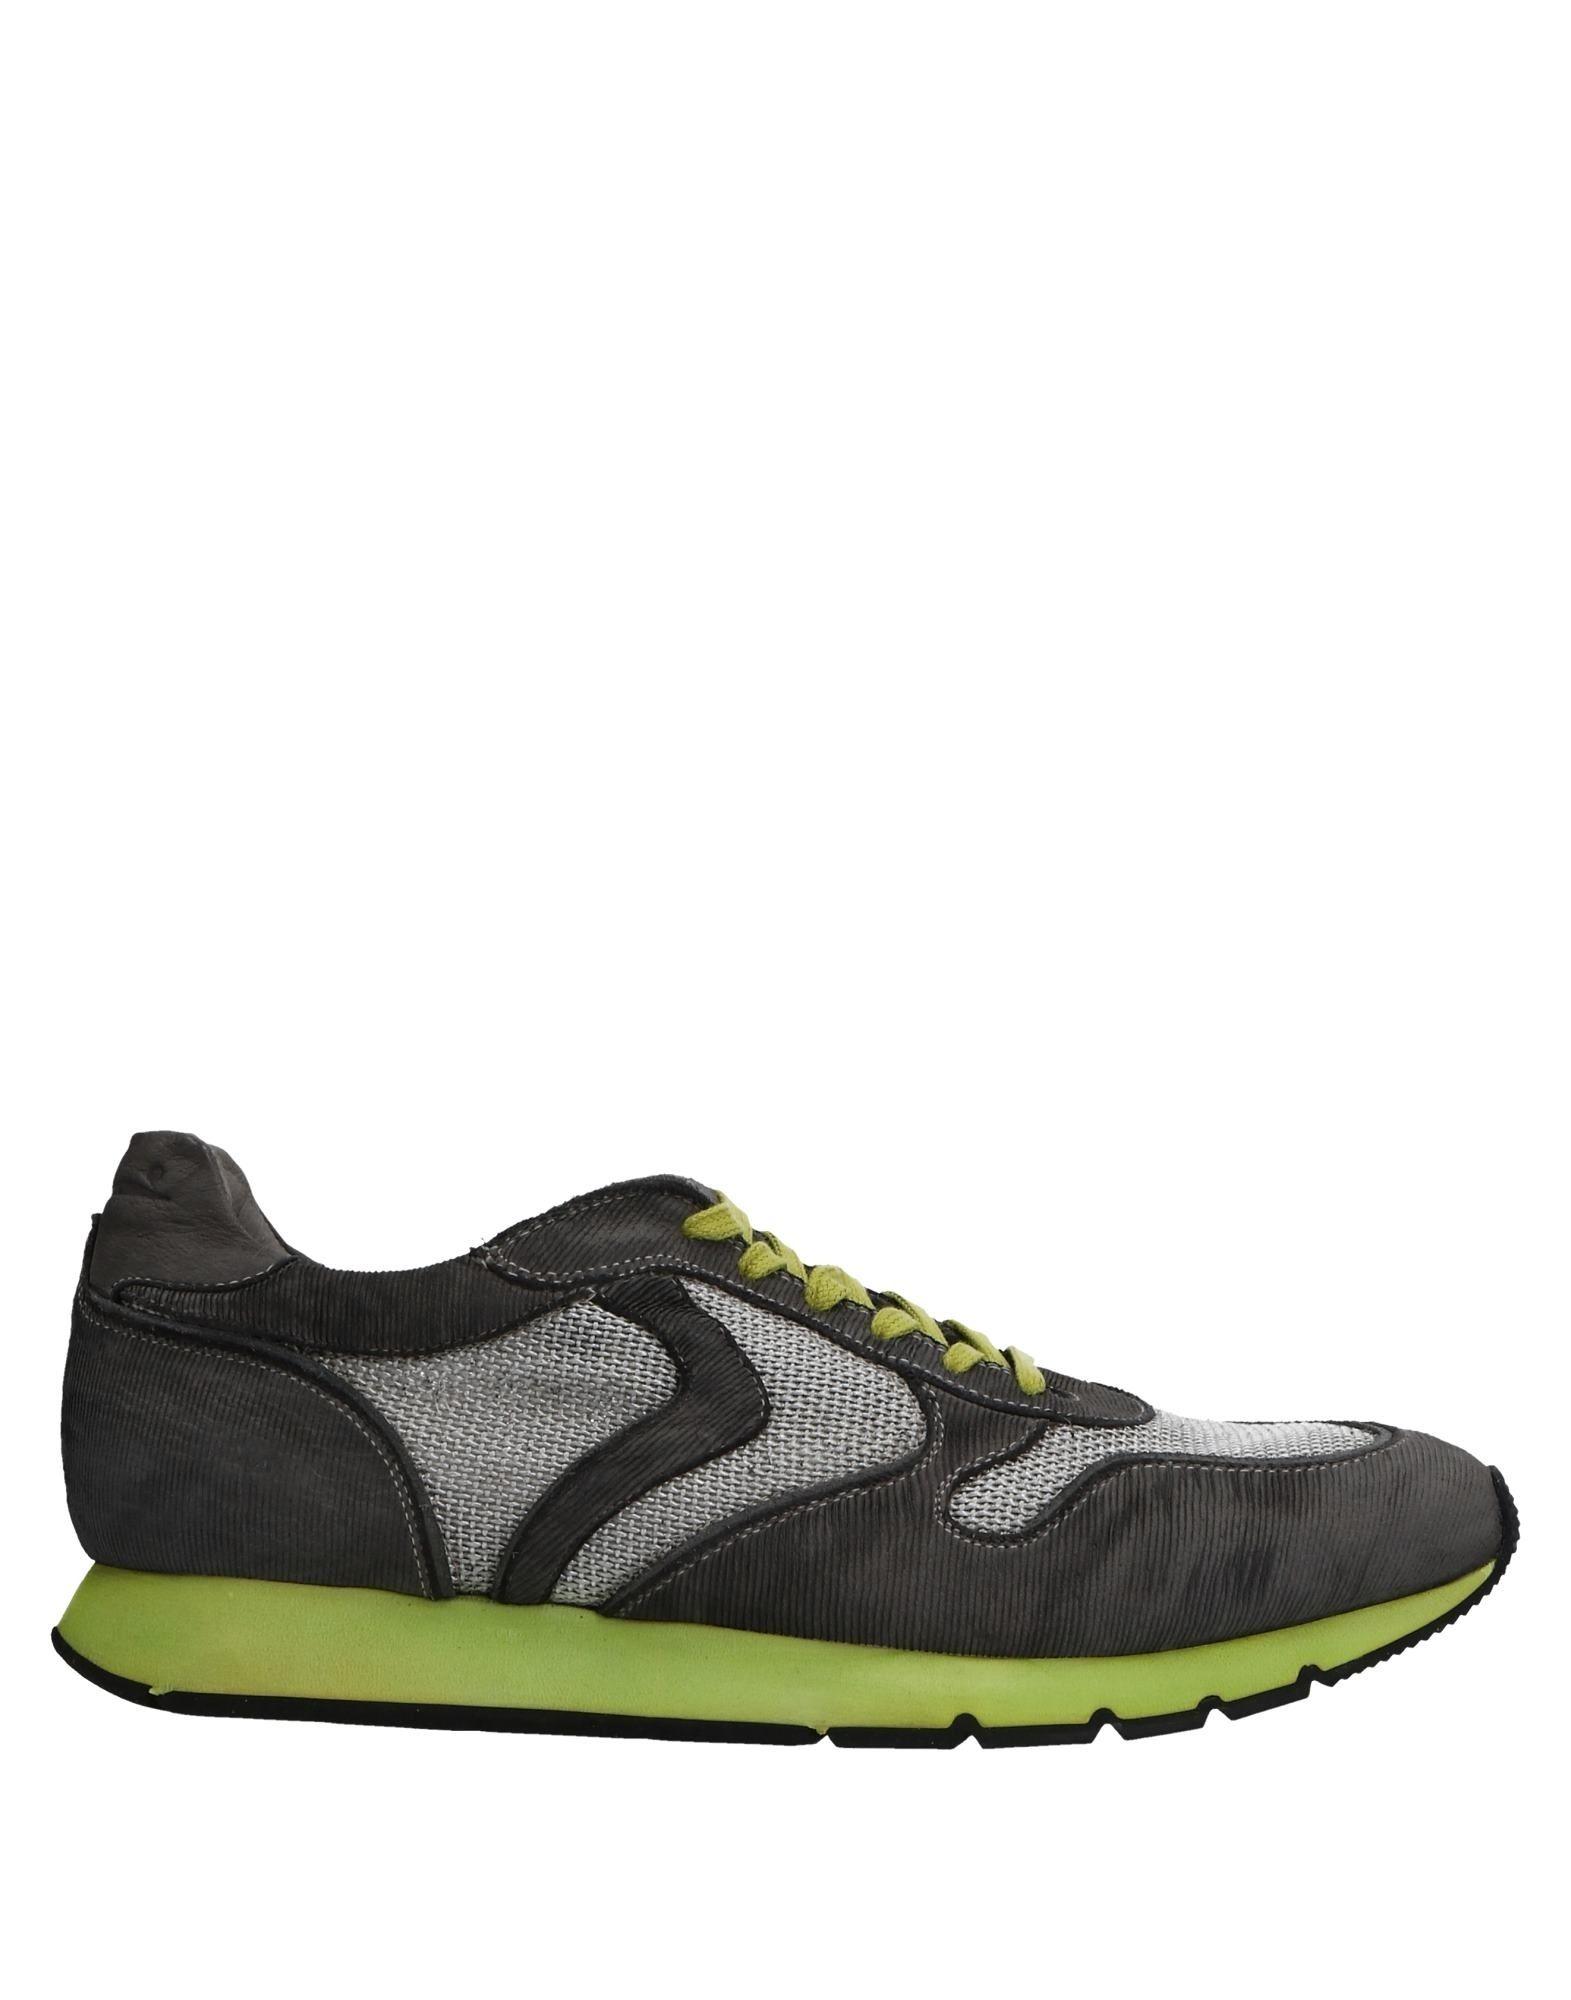 Sneakers Voile Blanche Uomo - 11531518GK